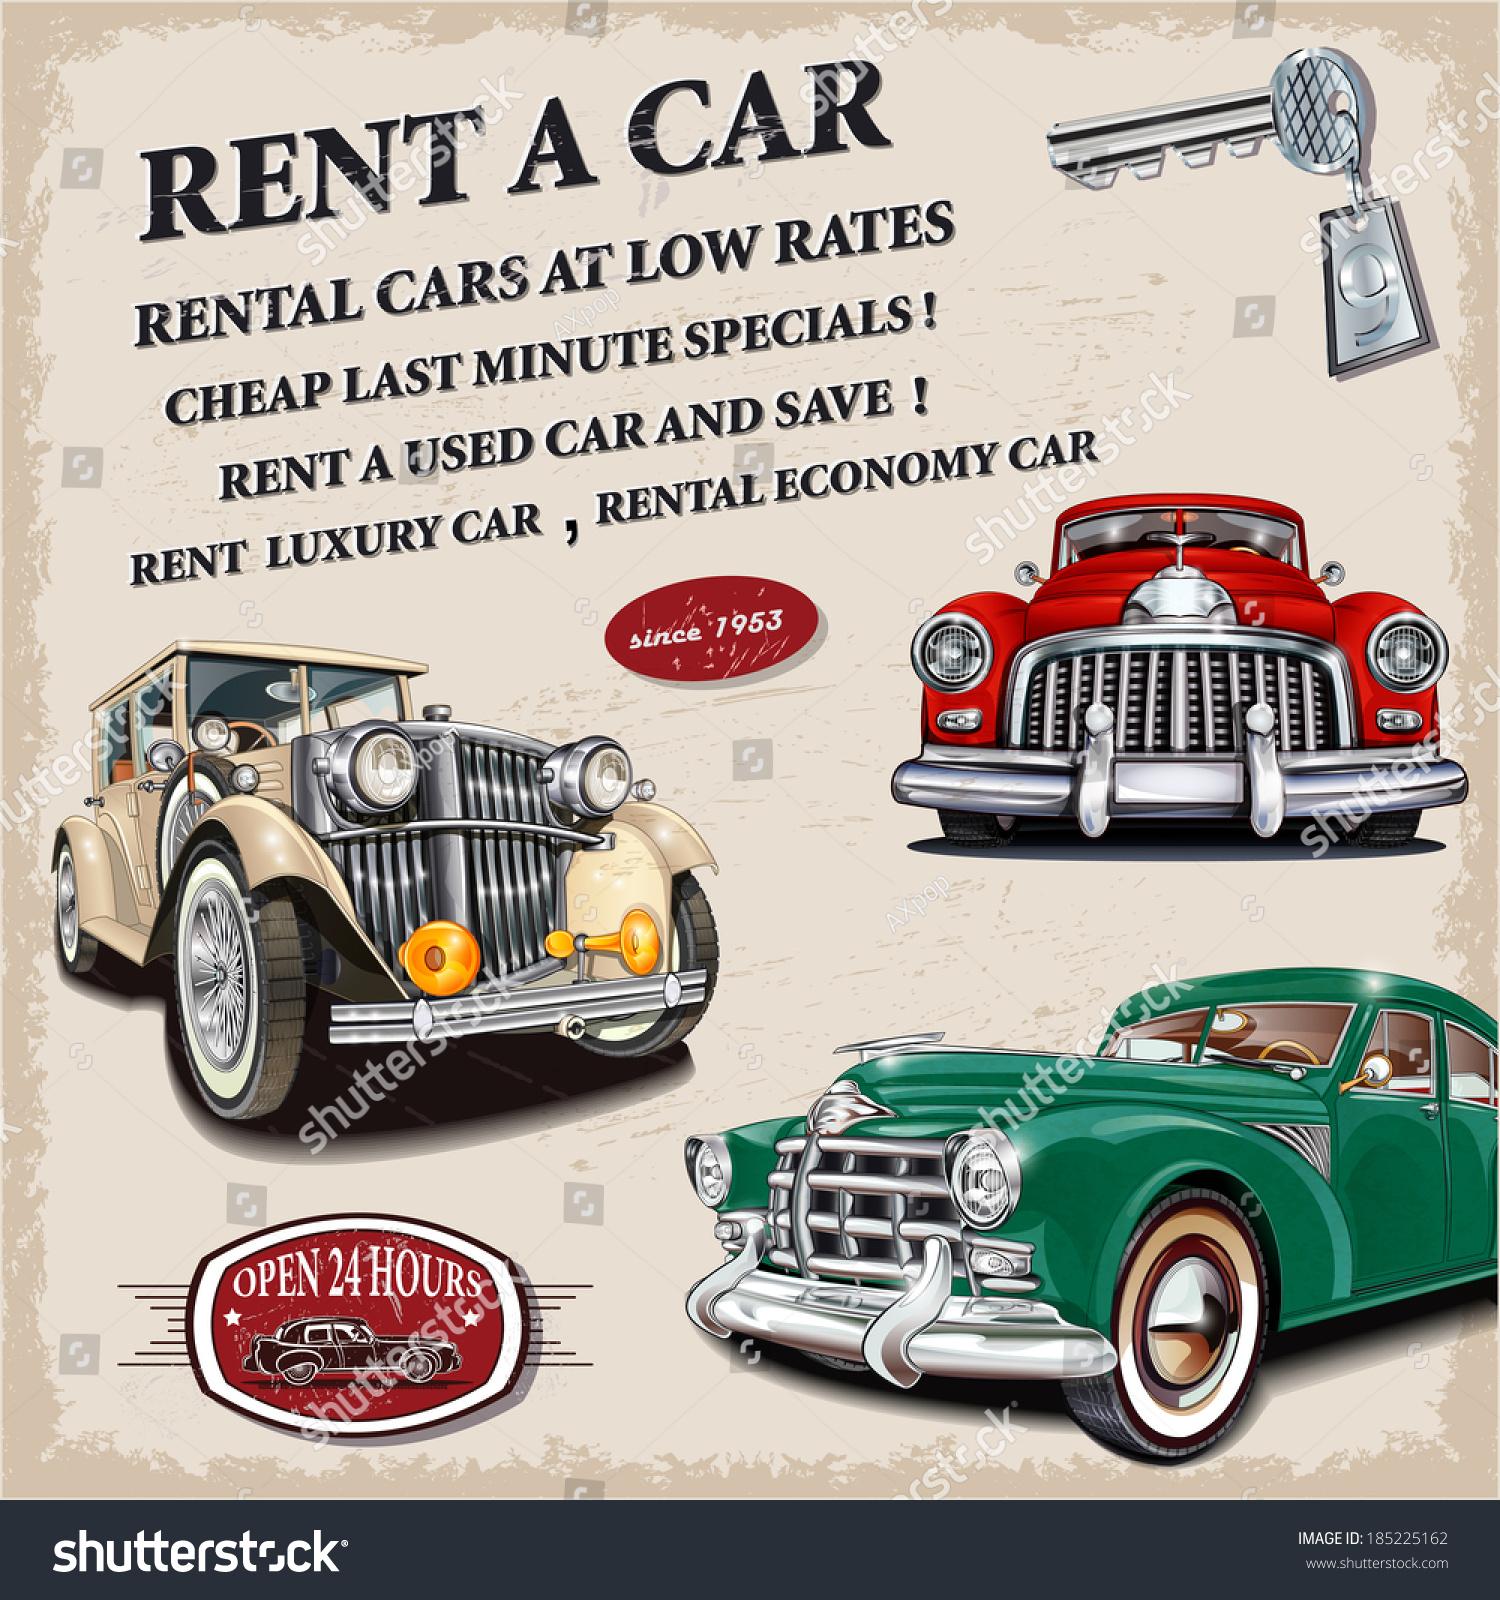 Rent a car retro poster. Rent Car Retro Poster Stock Vector 185225162   Shutterstock